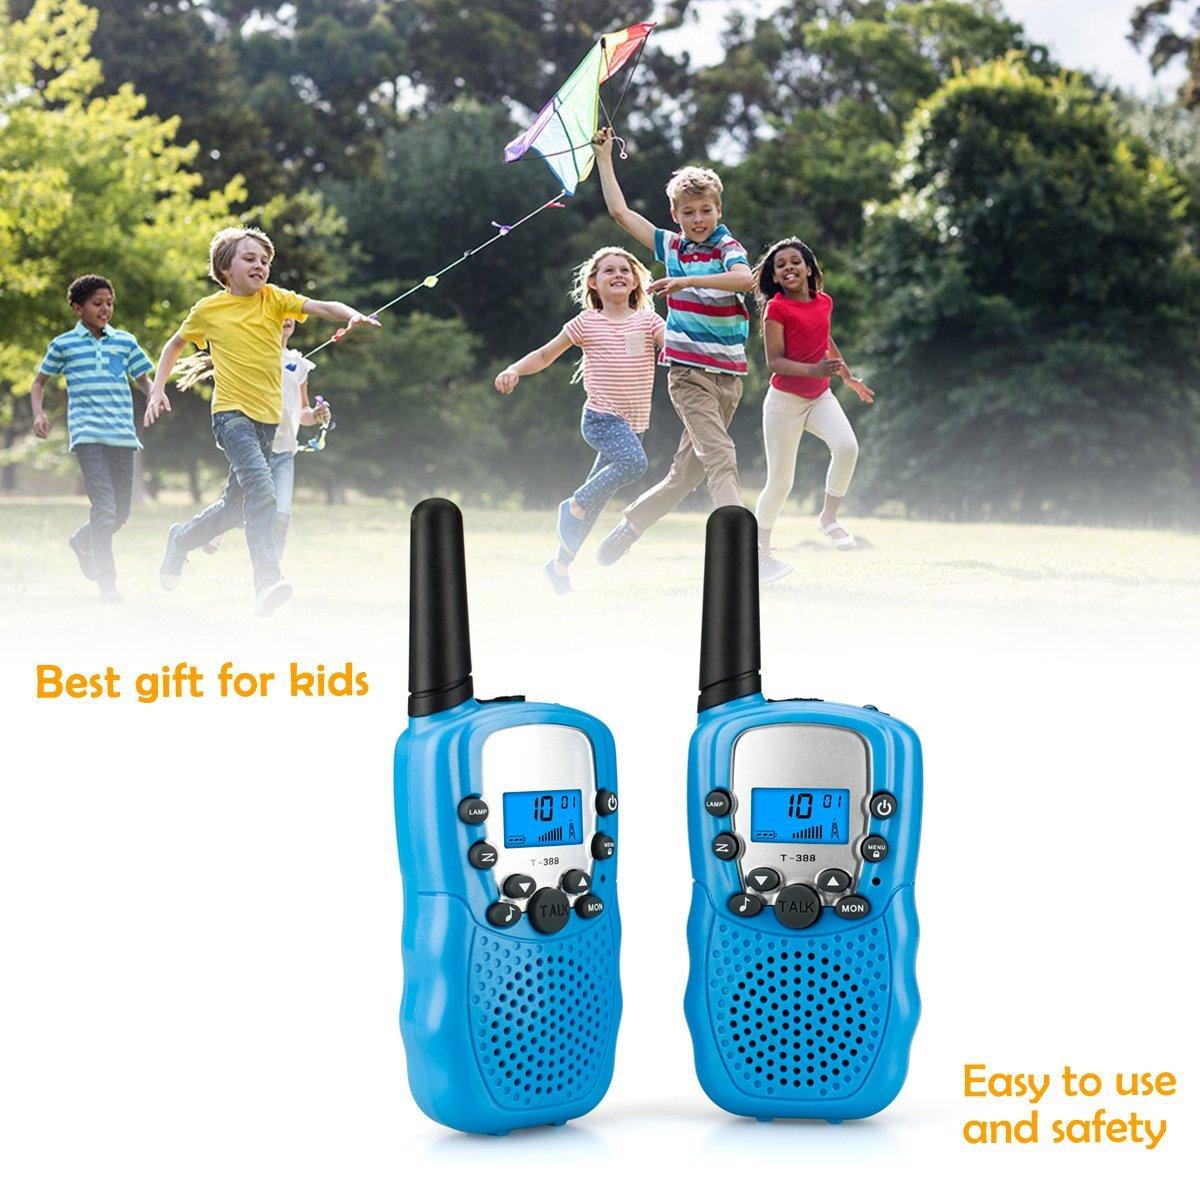 Walkie Talkies, ZoiyTop 22 Channel Two Way Radio 3-5 Miles FRS/GMRS Handheld Mini Walkie Talkies for Kids ( 2 Pcs Blue)